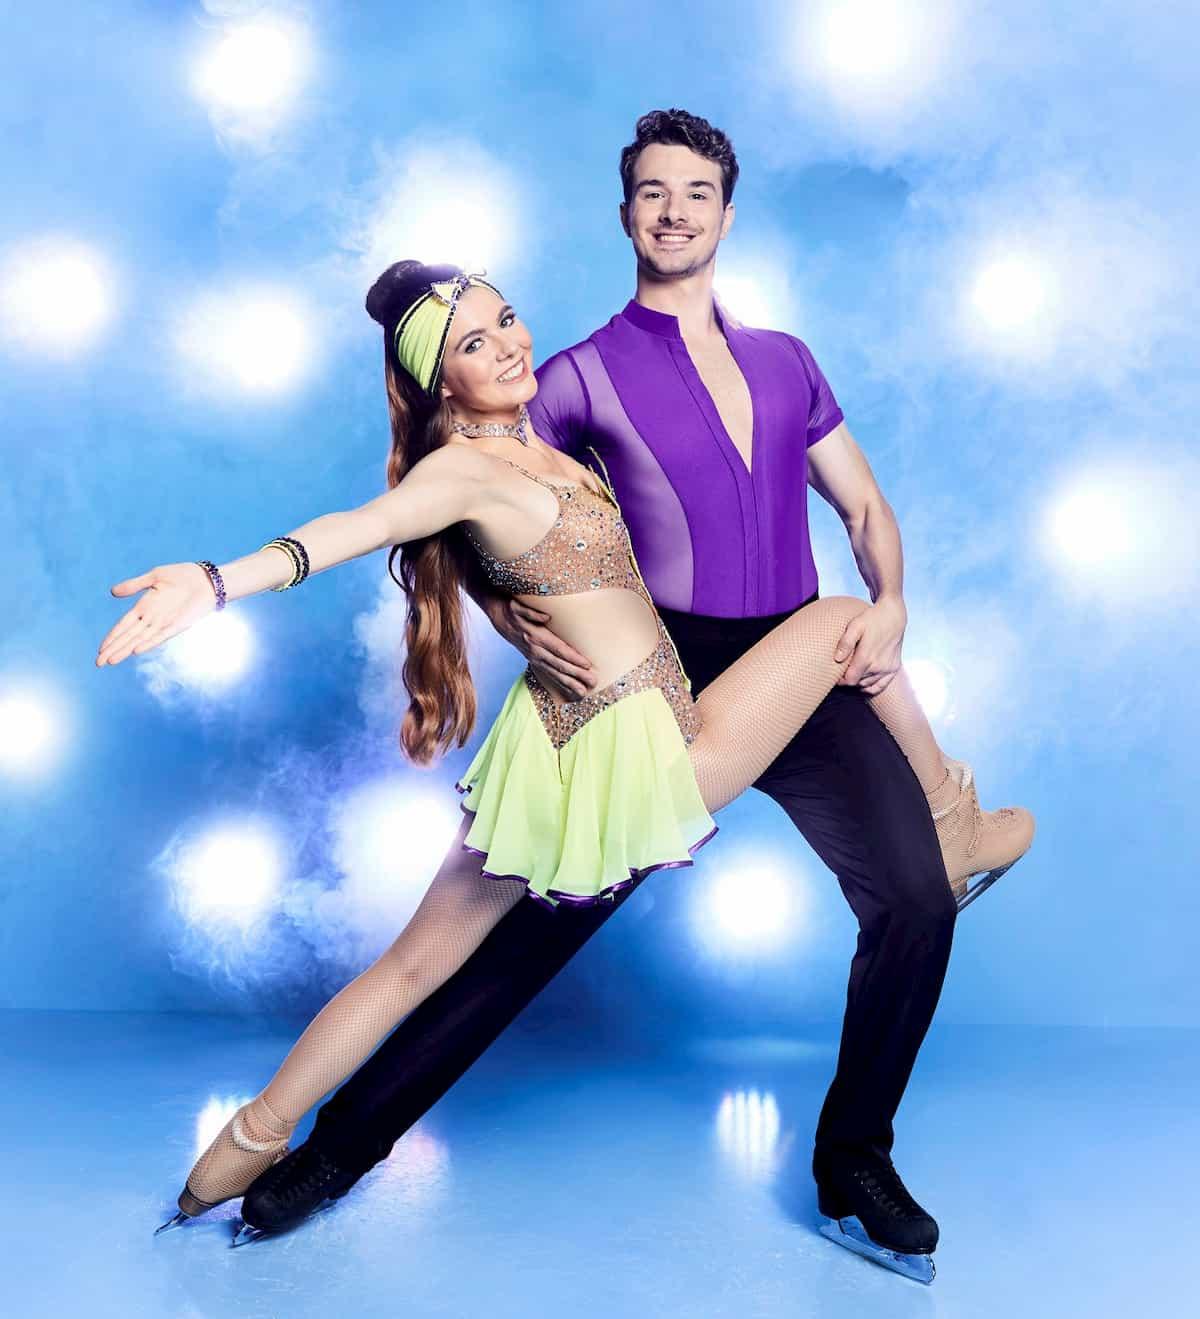 Klaudia mit K - Sevan Lerche bei Dancing on Ice 2019 Herbst zweite Staffel